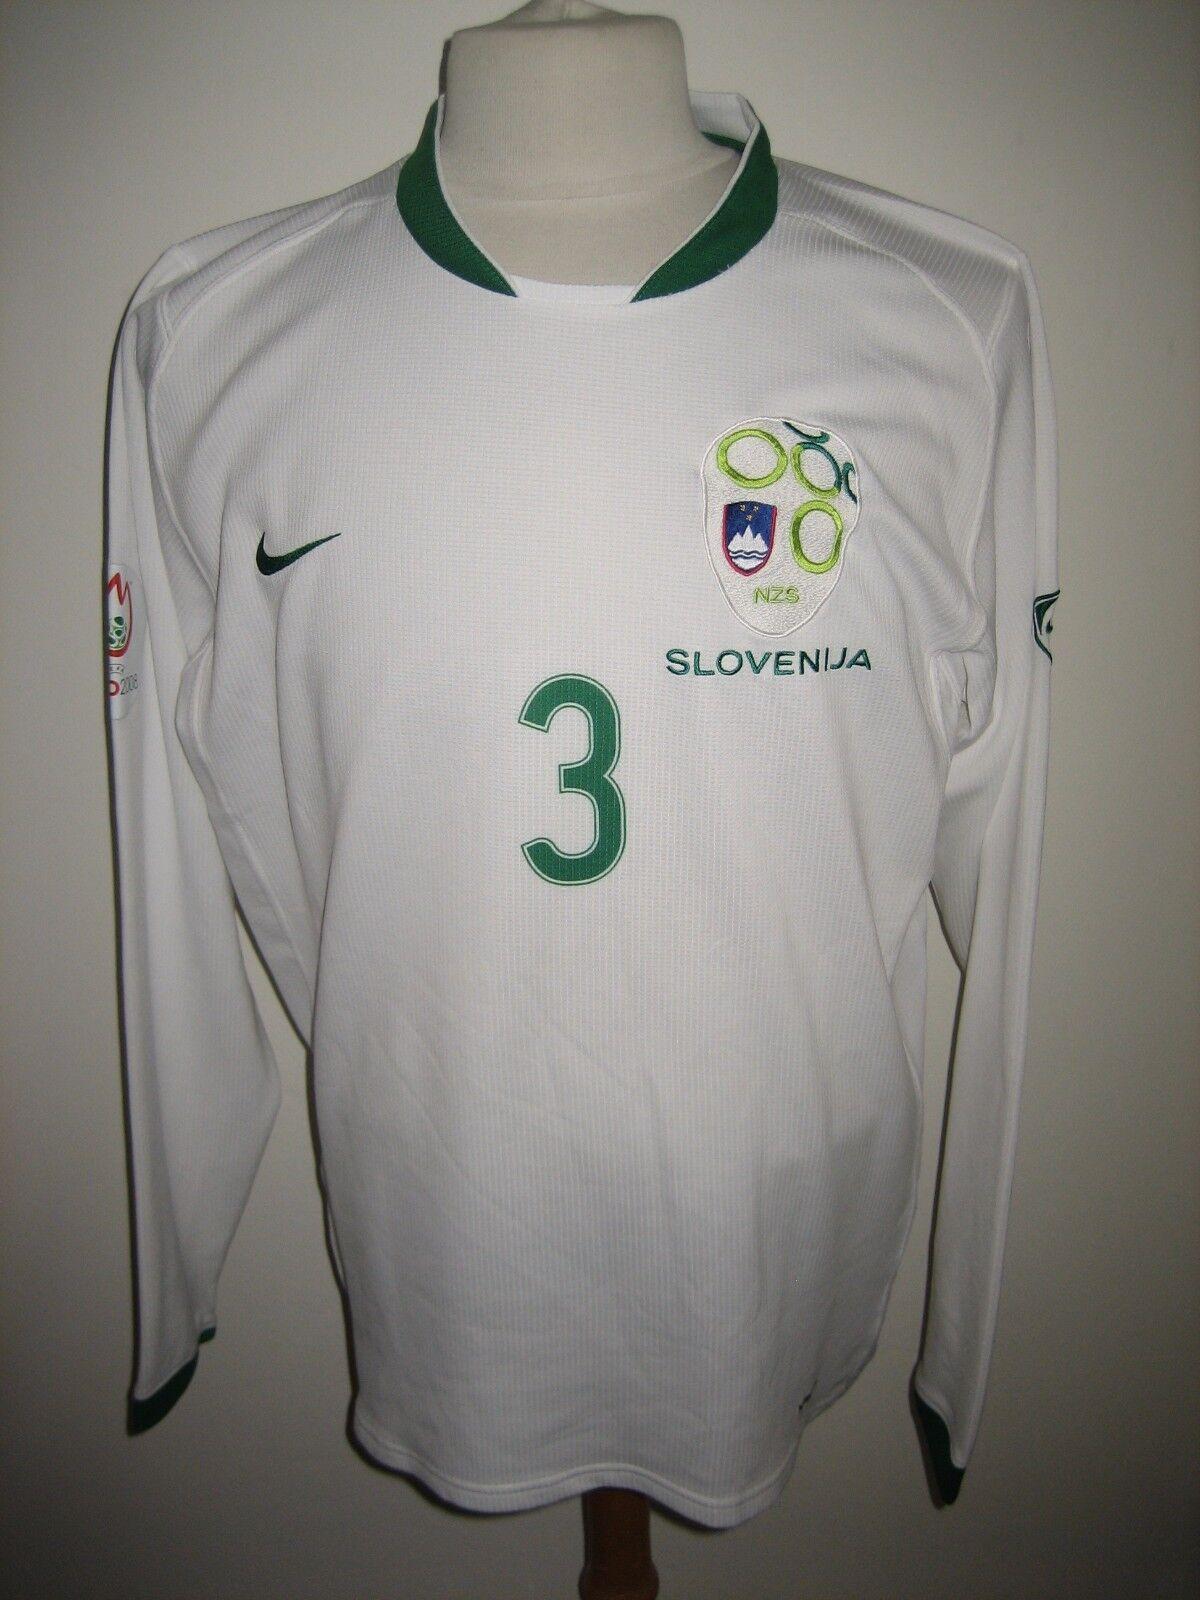 Slowenien gegen Holland MATCH WORN Fußballshirt Fußball Trikot Trikot L